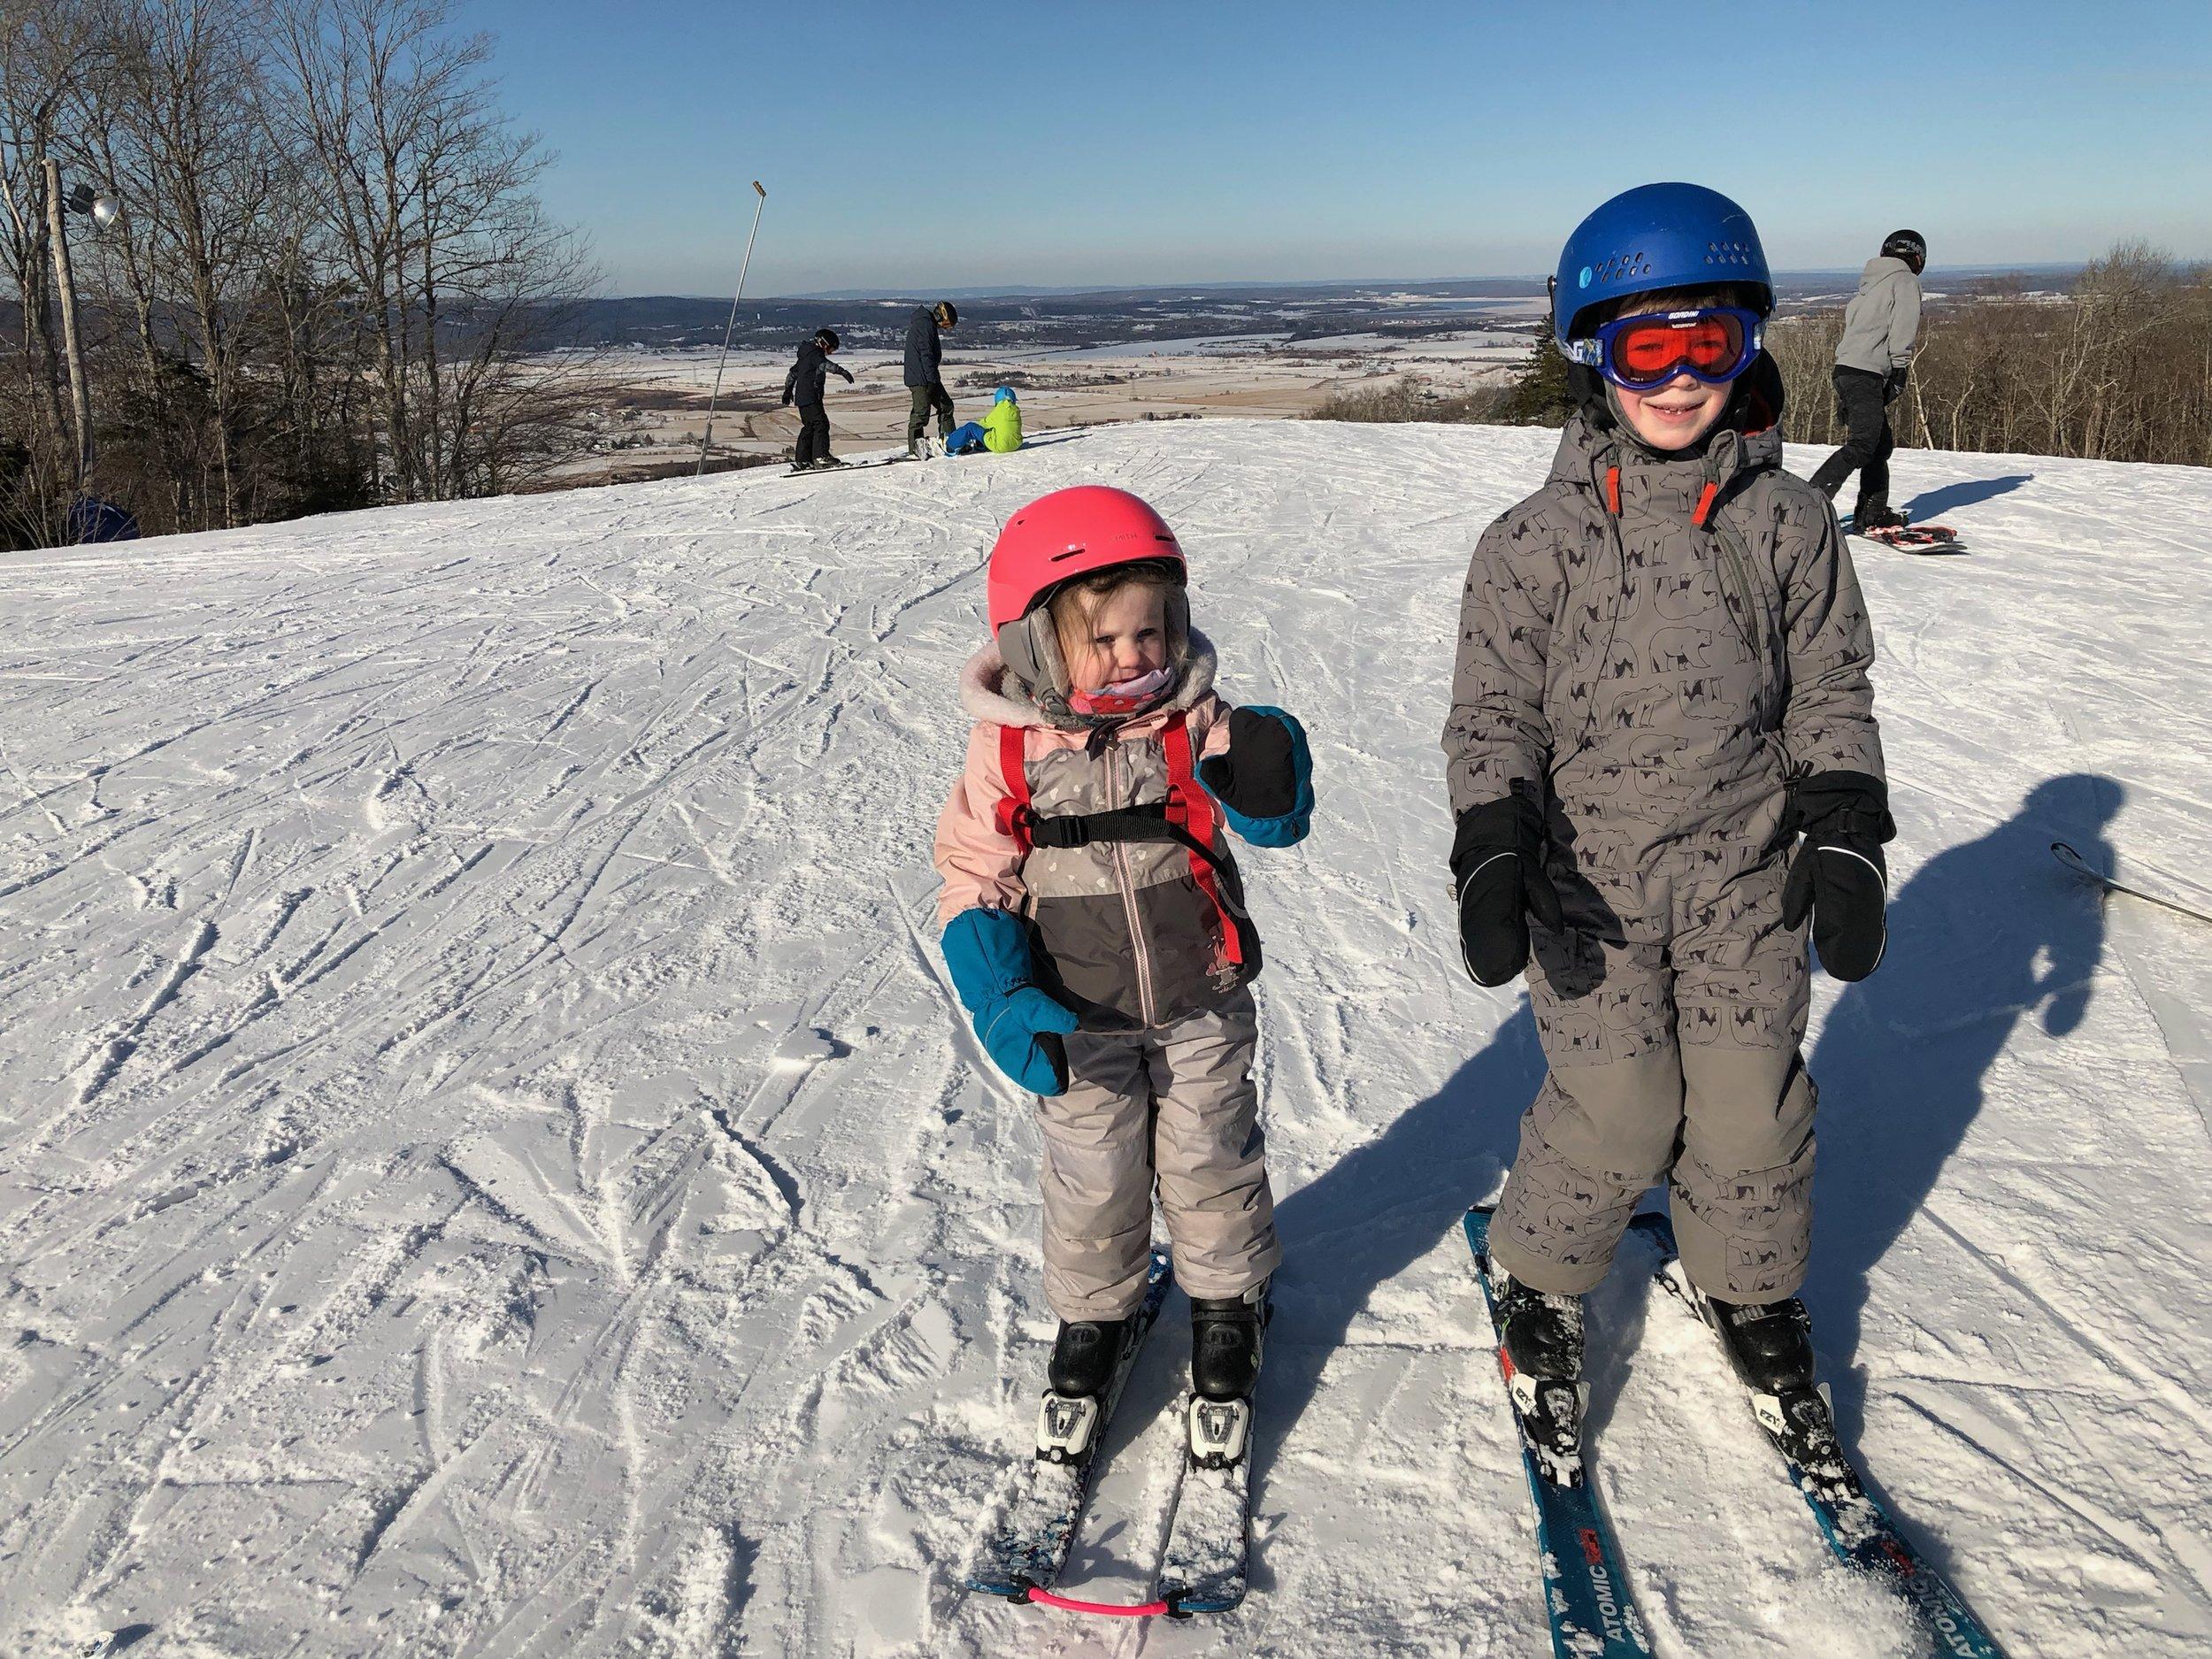 Martock skiing